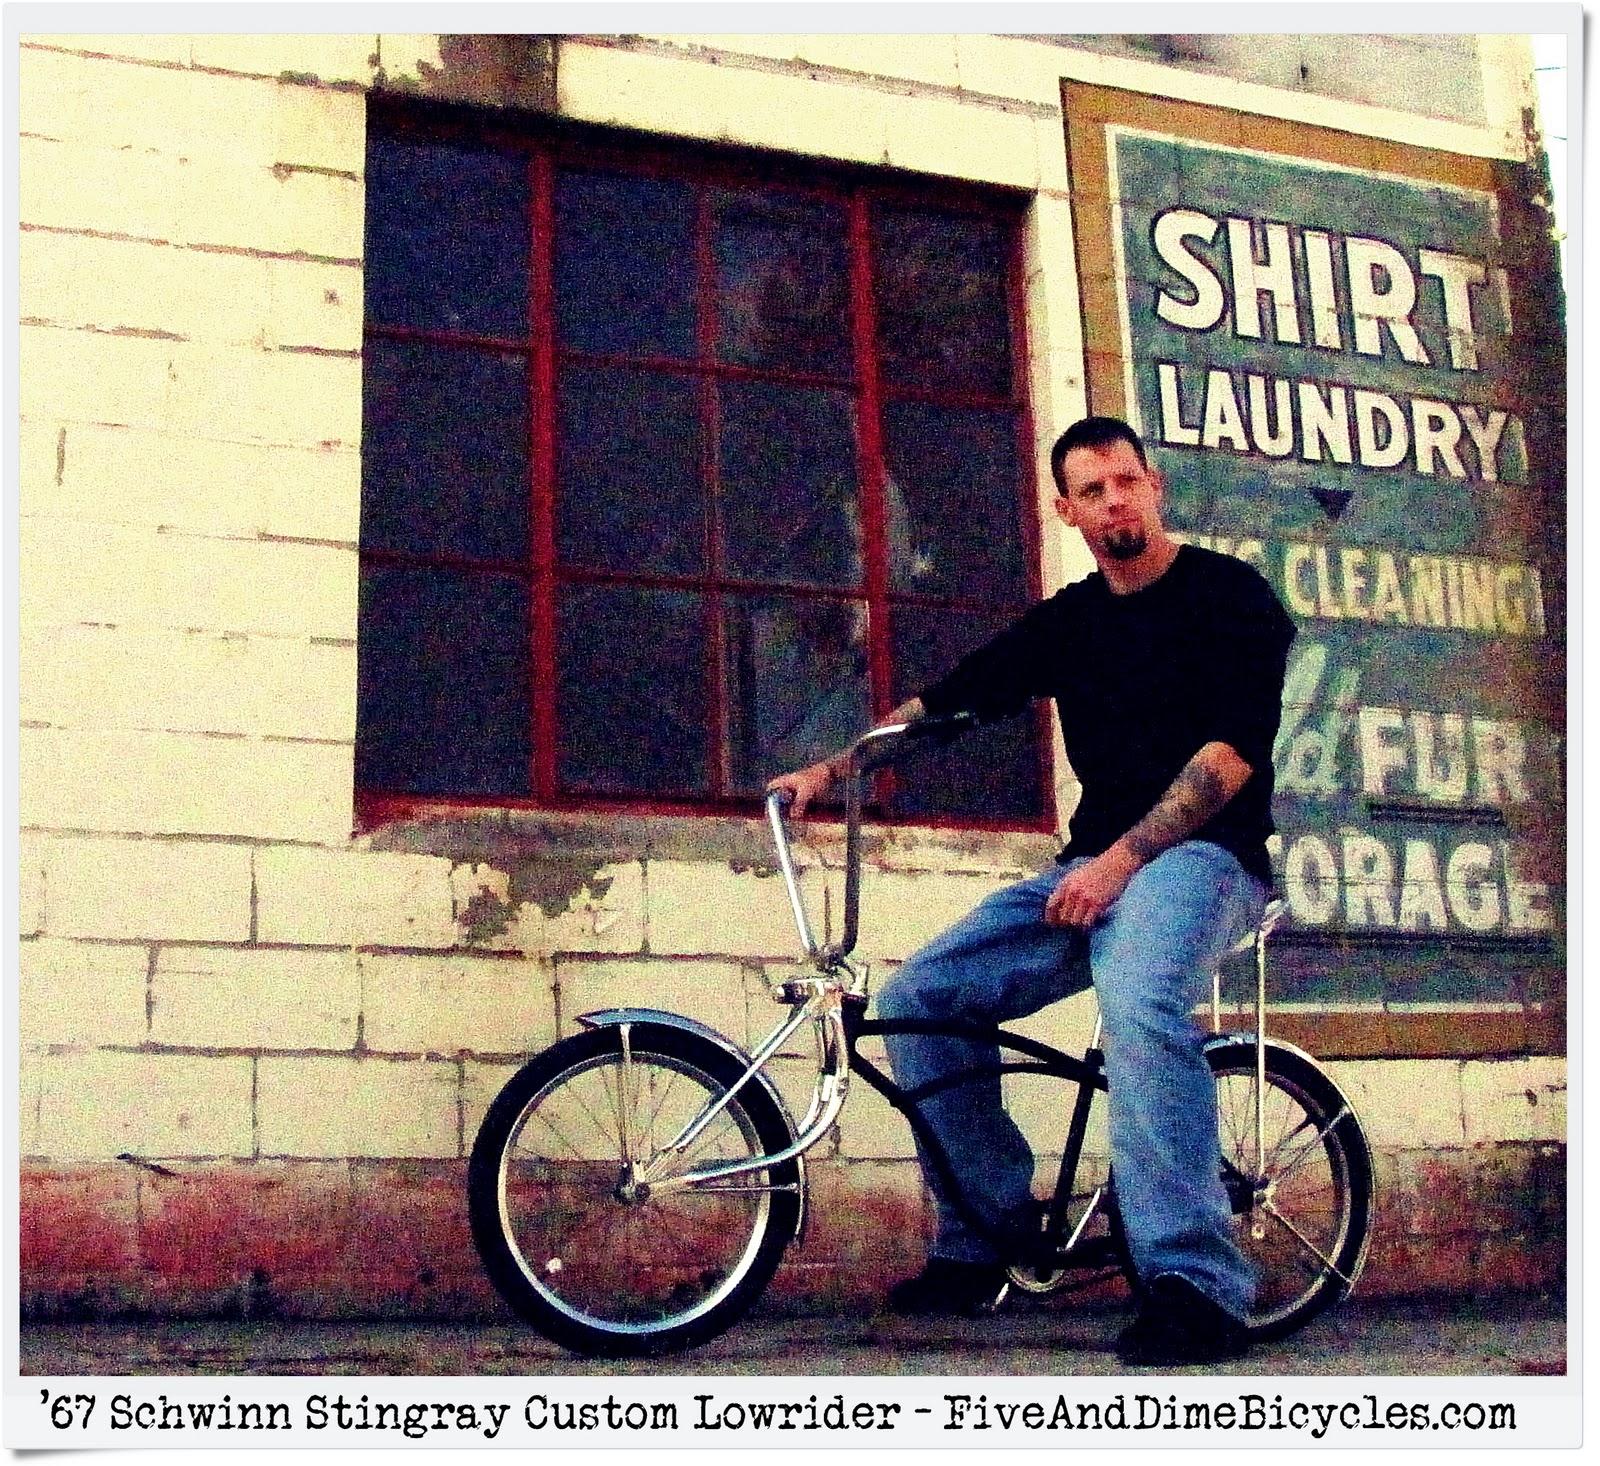 http://3.bp.blogspot.com/__Ughe5pLop4/TNAeVDNZd1I/AAAAAAAAANg/L3jcZqynmjE/s1600/bike+pics+009+cropped.JPG